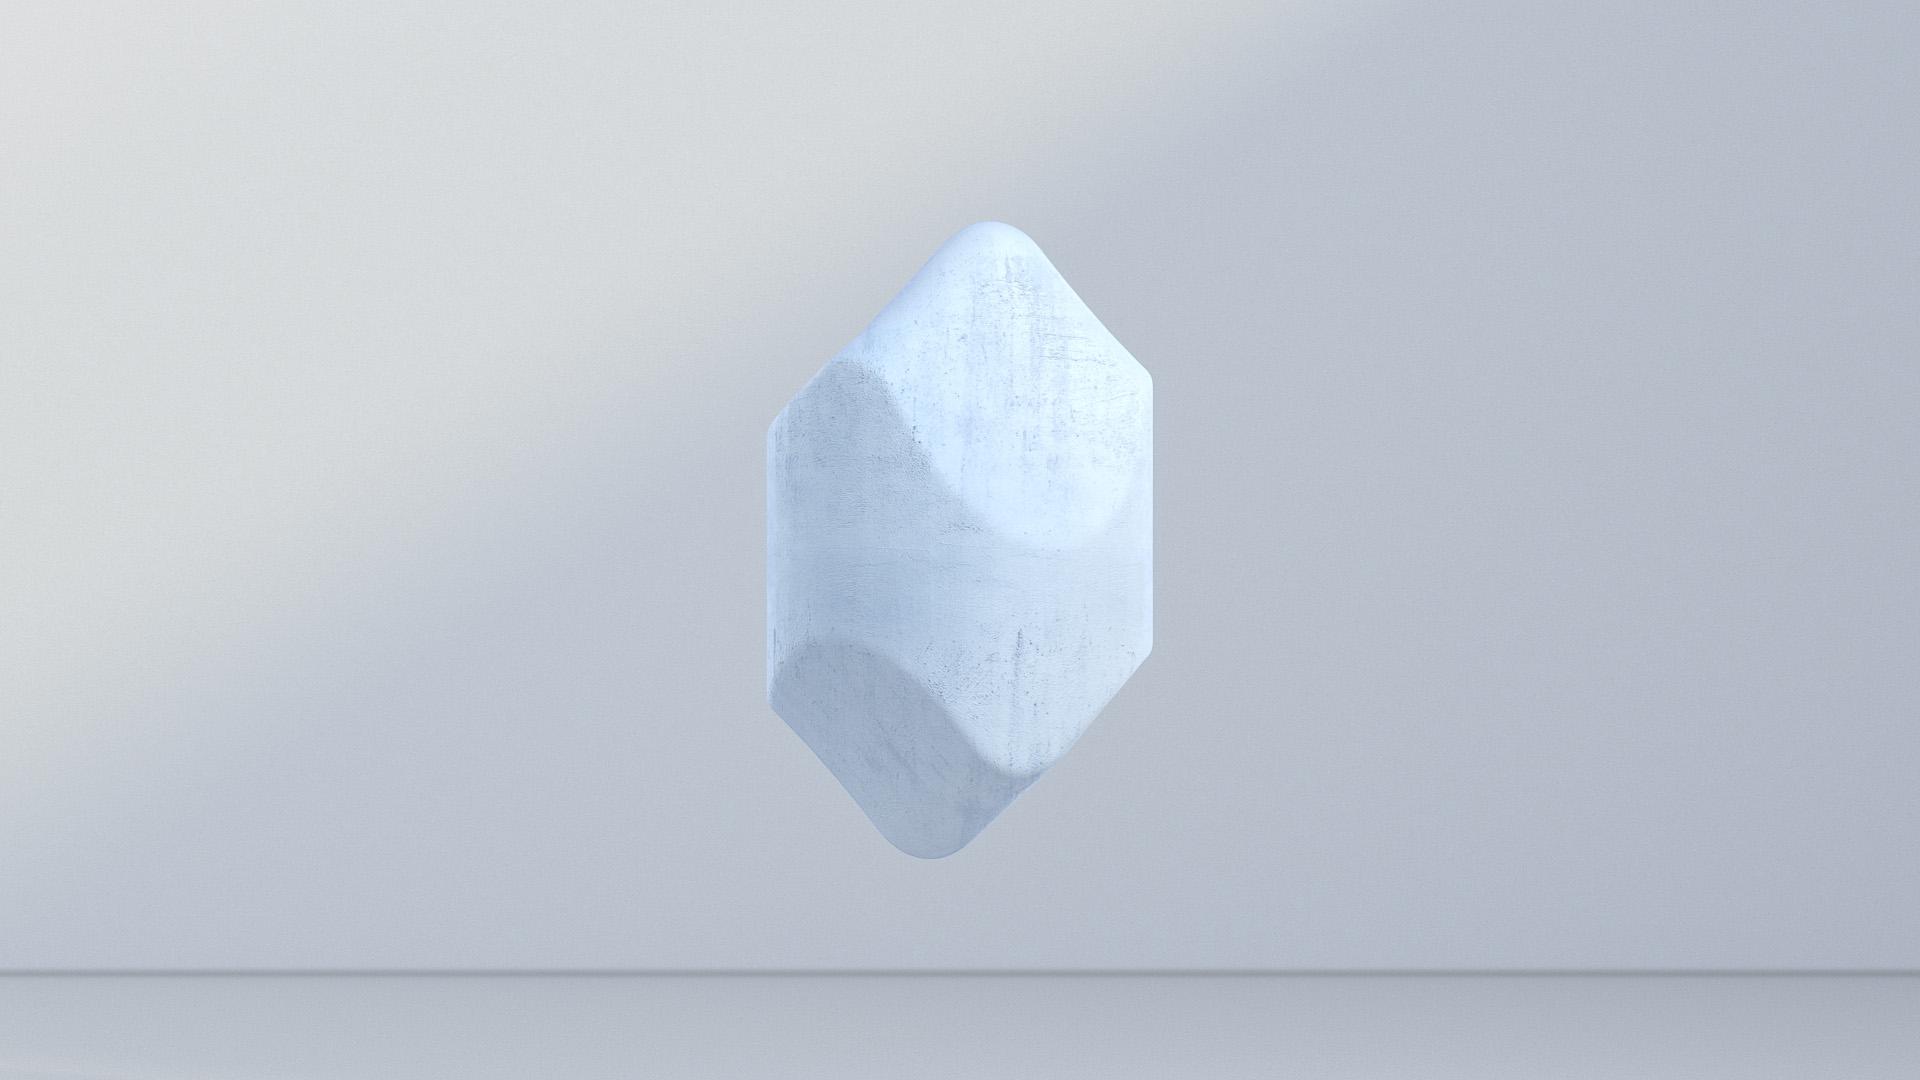 New_icons_seq_v002_003.jpg